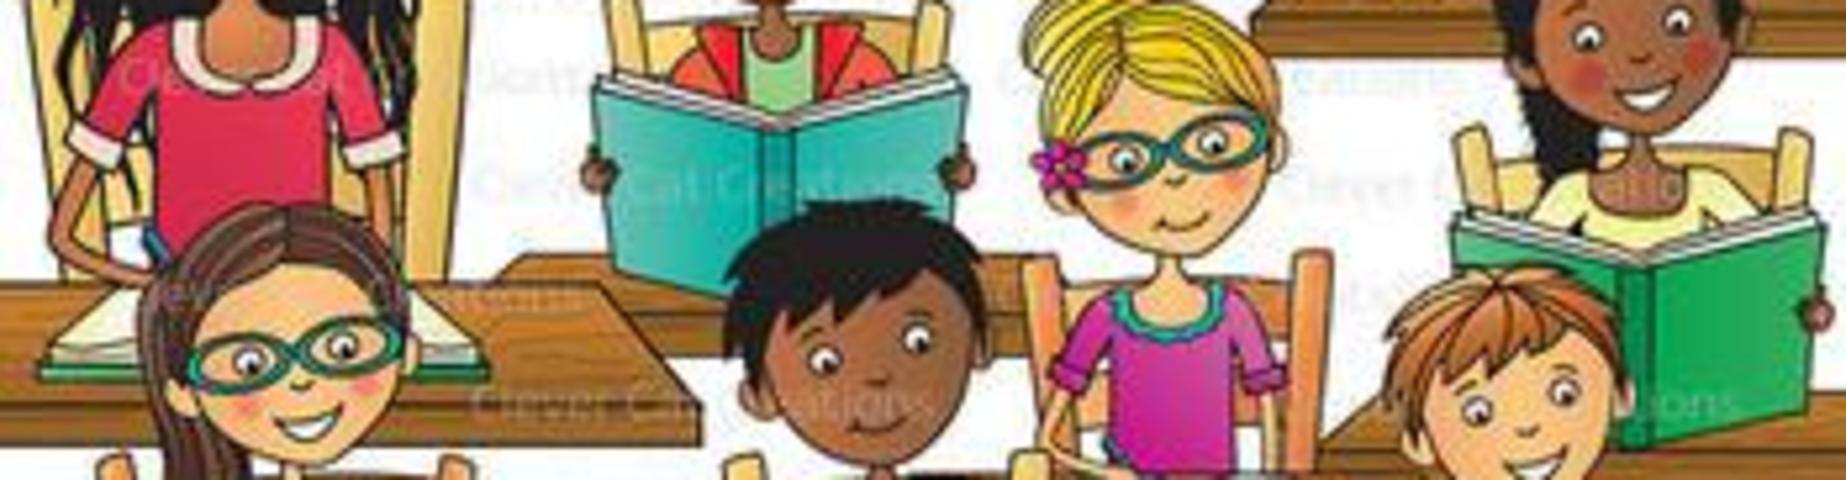 Children studying image